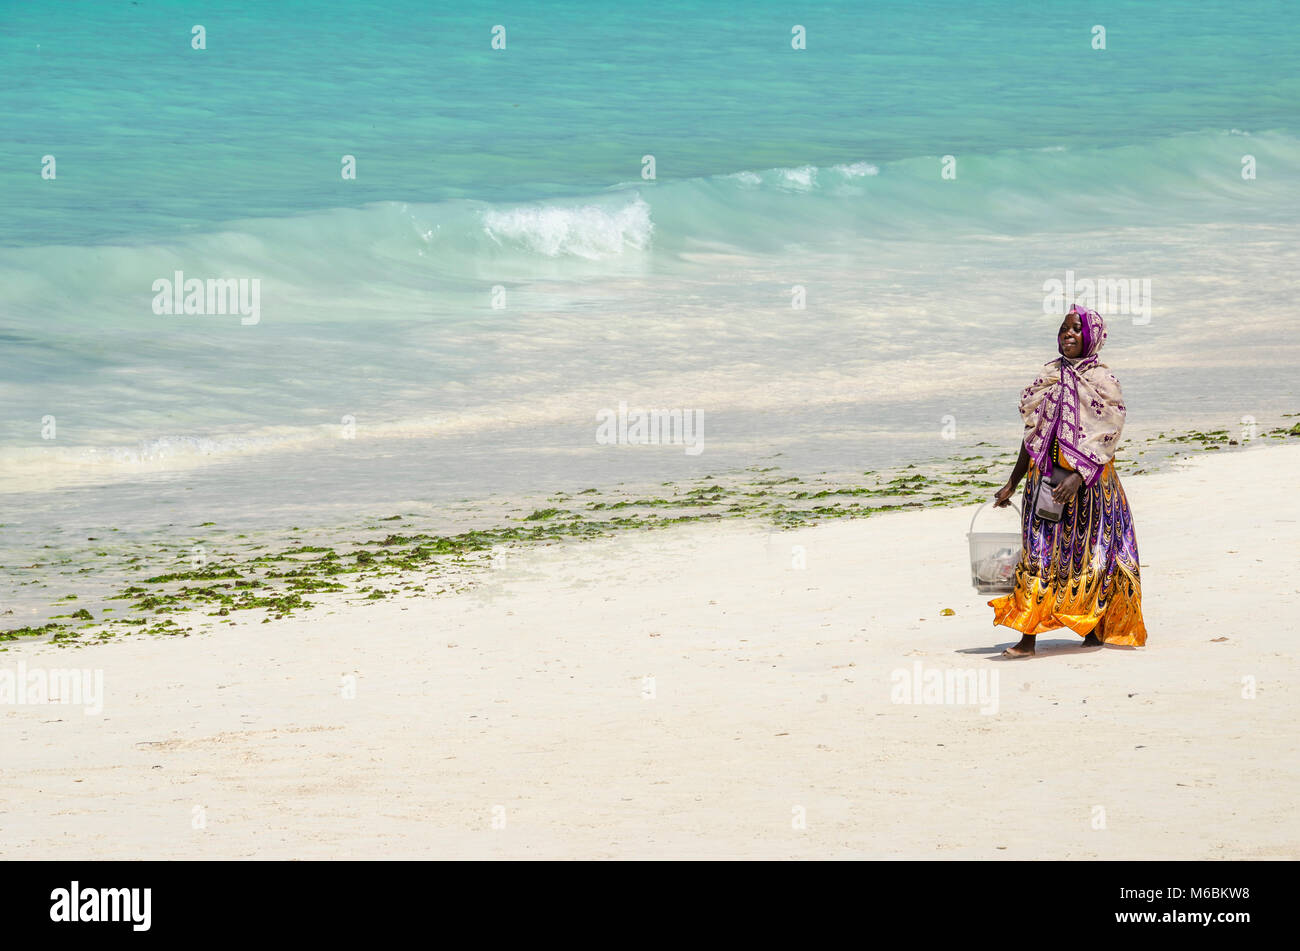 Zanzibar, Tanzania - December 4, 2014: Muslim woman with colorful clothes walking along the Nungwi beach. - Stock Image